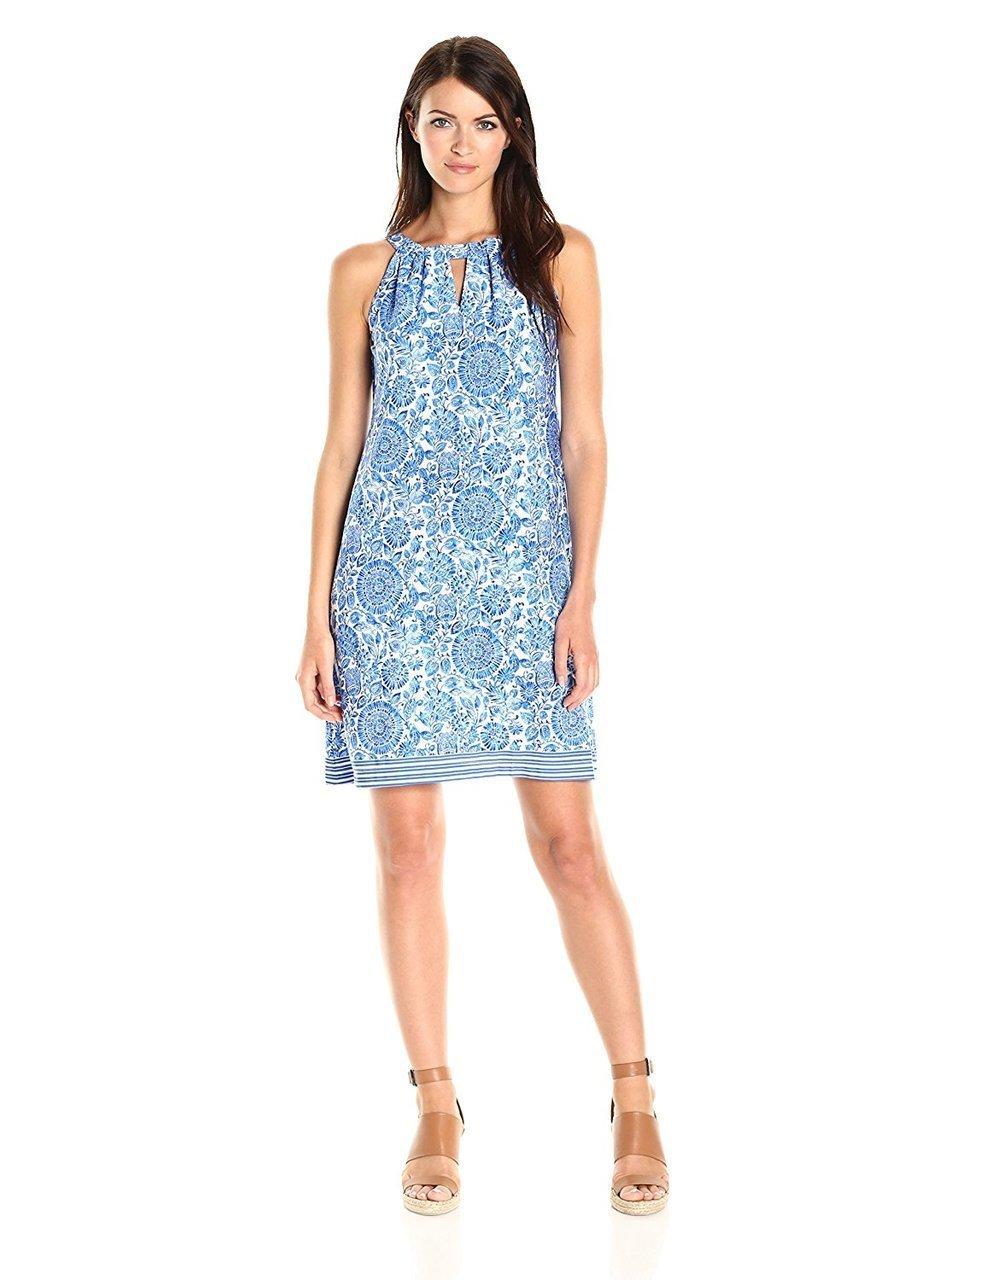 Taylor - 9171MJ Aquarelle Print Sheath Dress